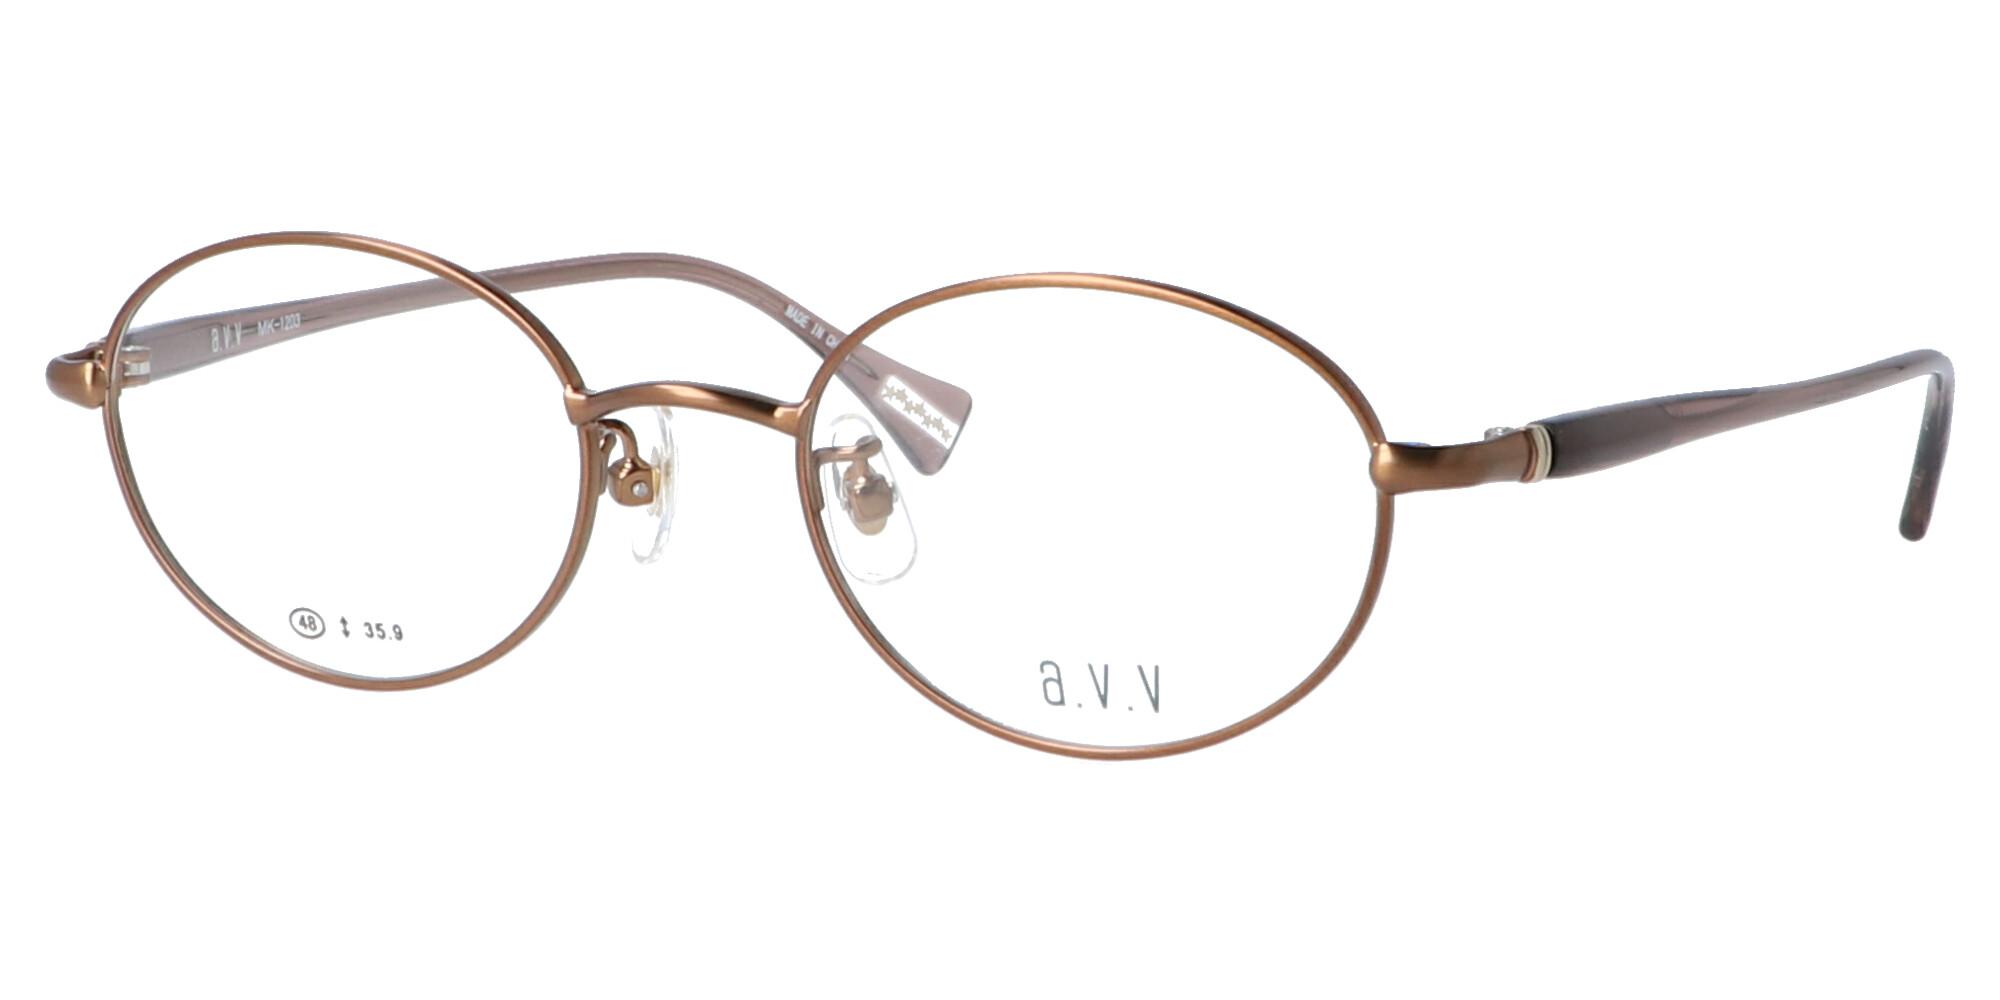 AVV MK1203_48_ブラウン